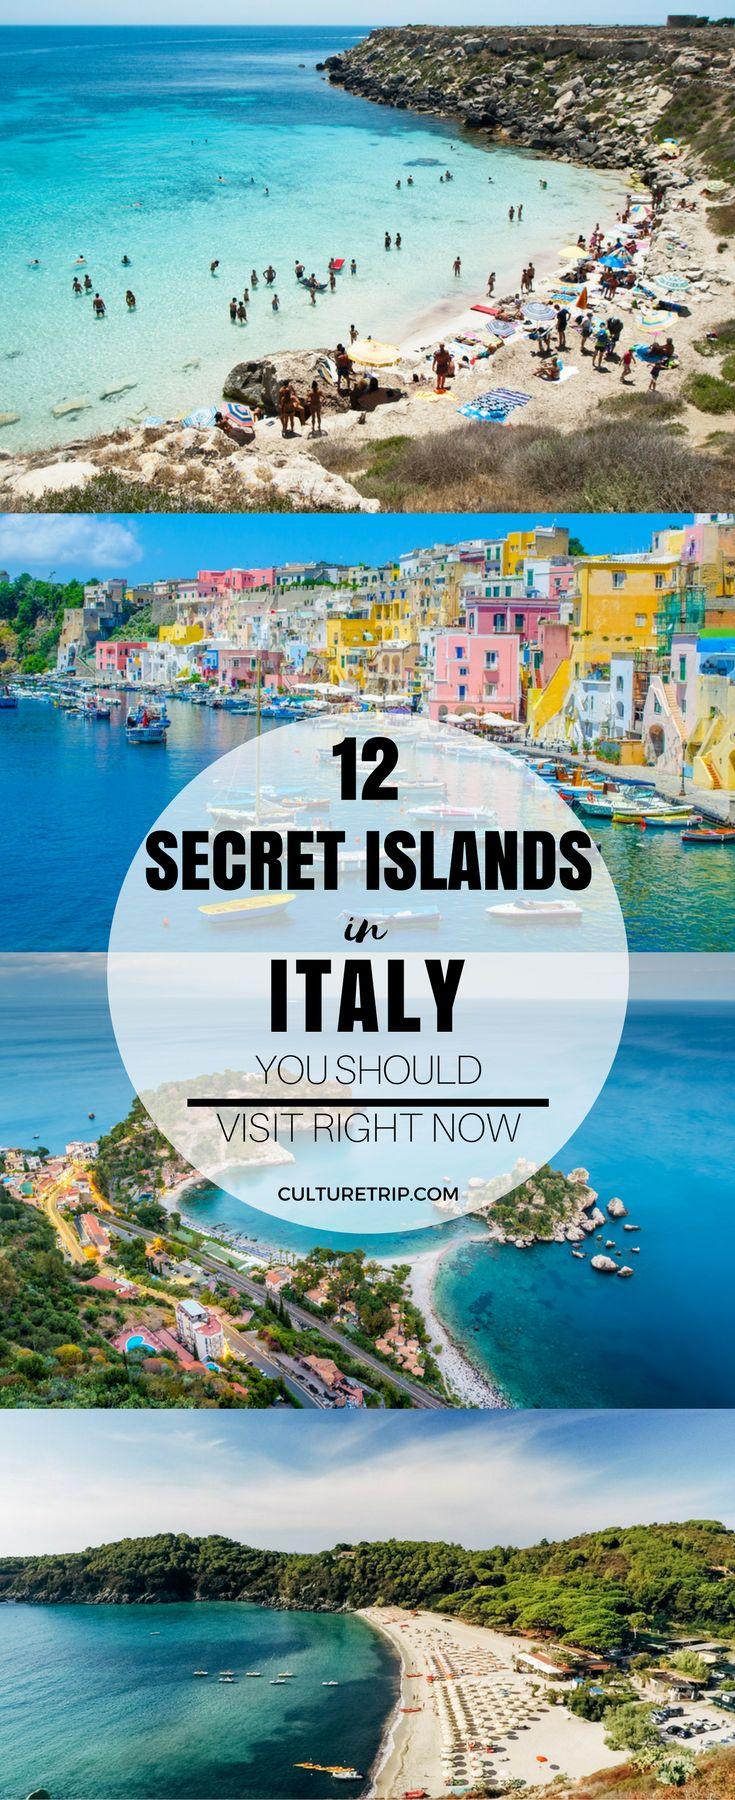 12 Secret Italian Islands You Should Visit|Pinterest: @theculturetrip